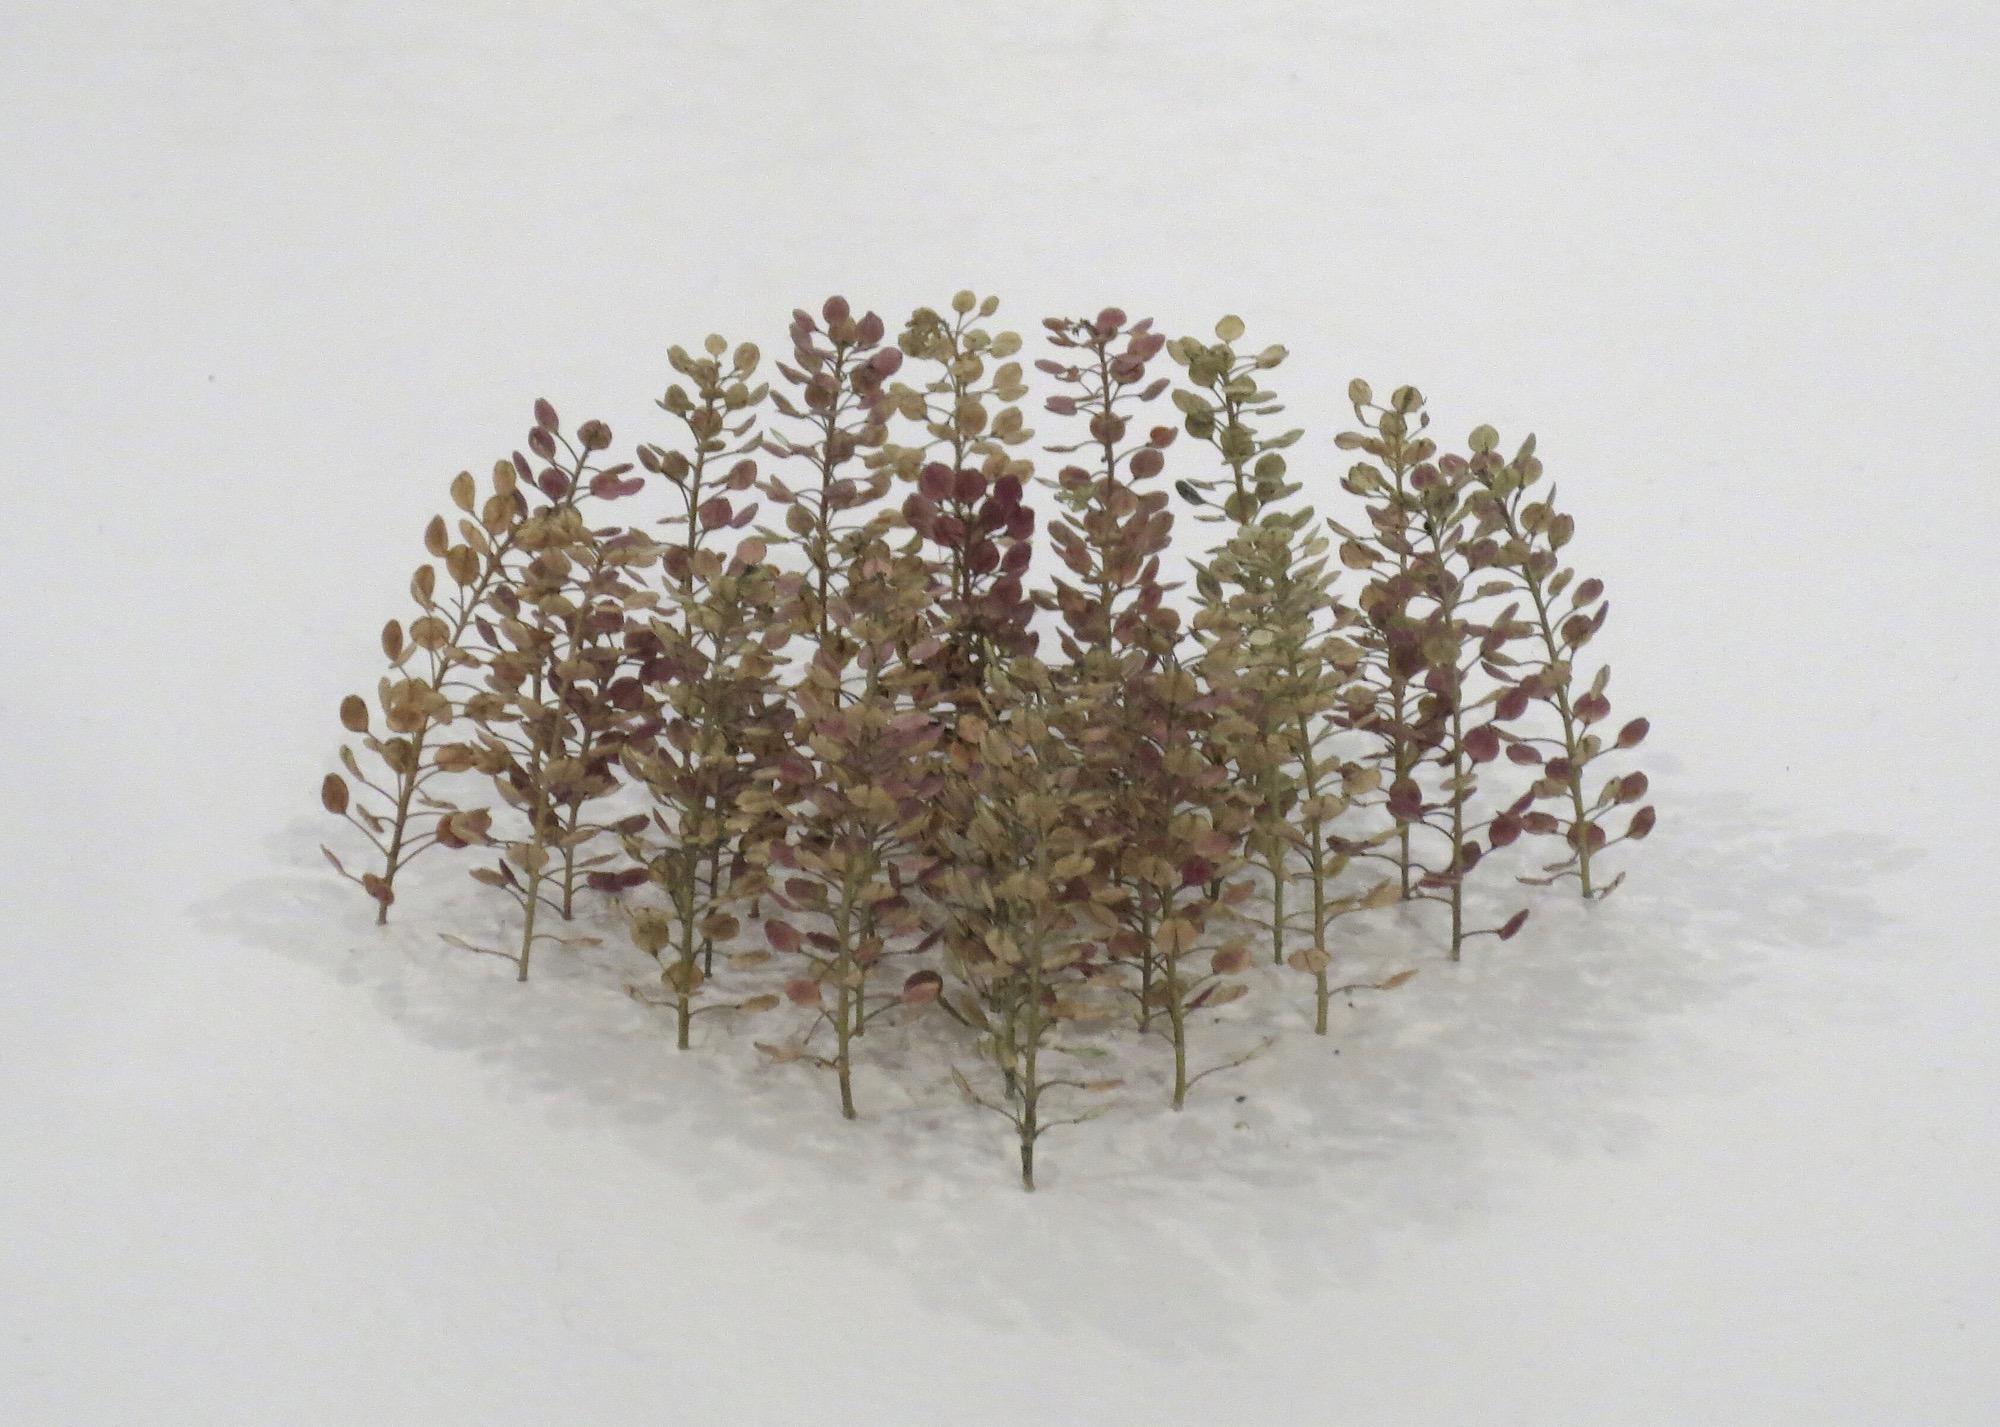 Christiane Löhr    Concave Form/Cube [KonkaveForm/Quadrat] , 2018 Plant stalks 13 3/4 x 3 1/8 x 3 1/8 inches  35 x 8 x 8 cm